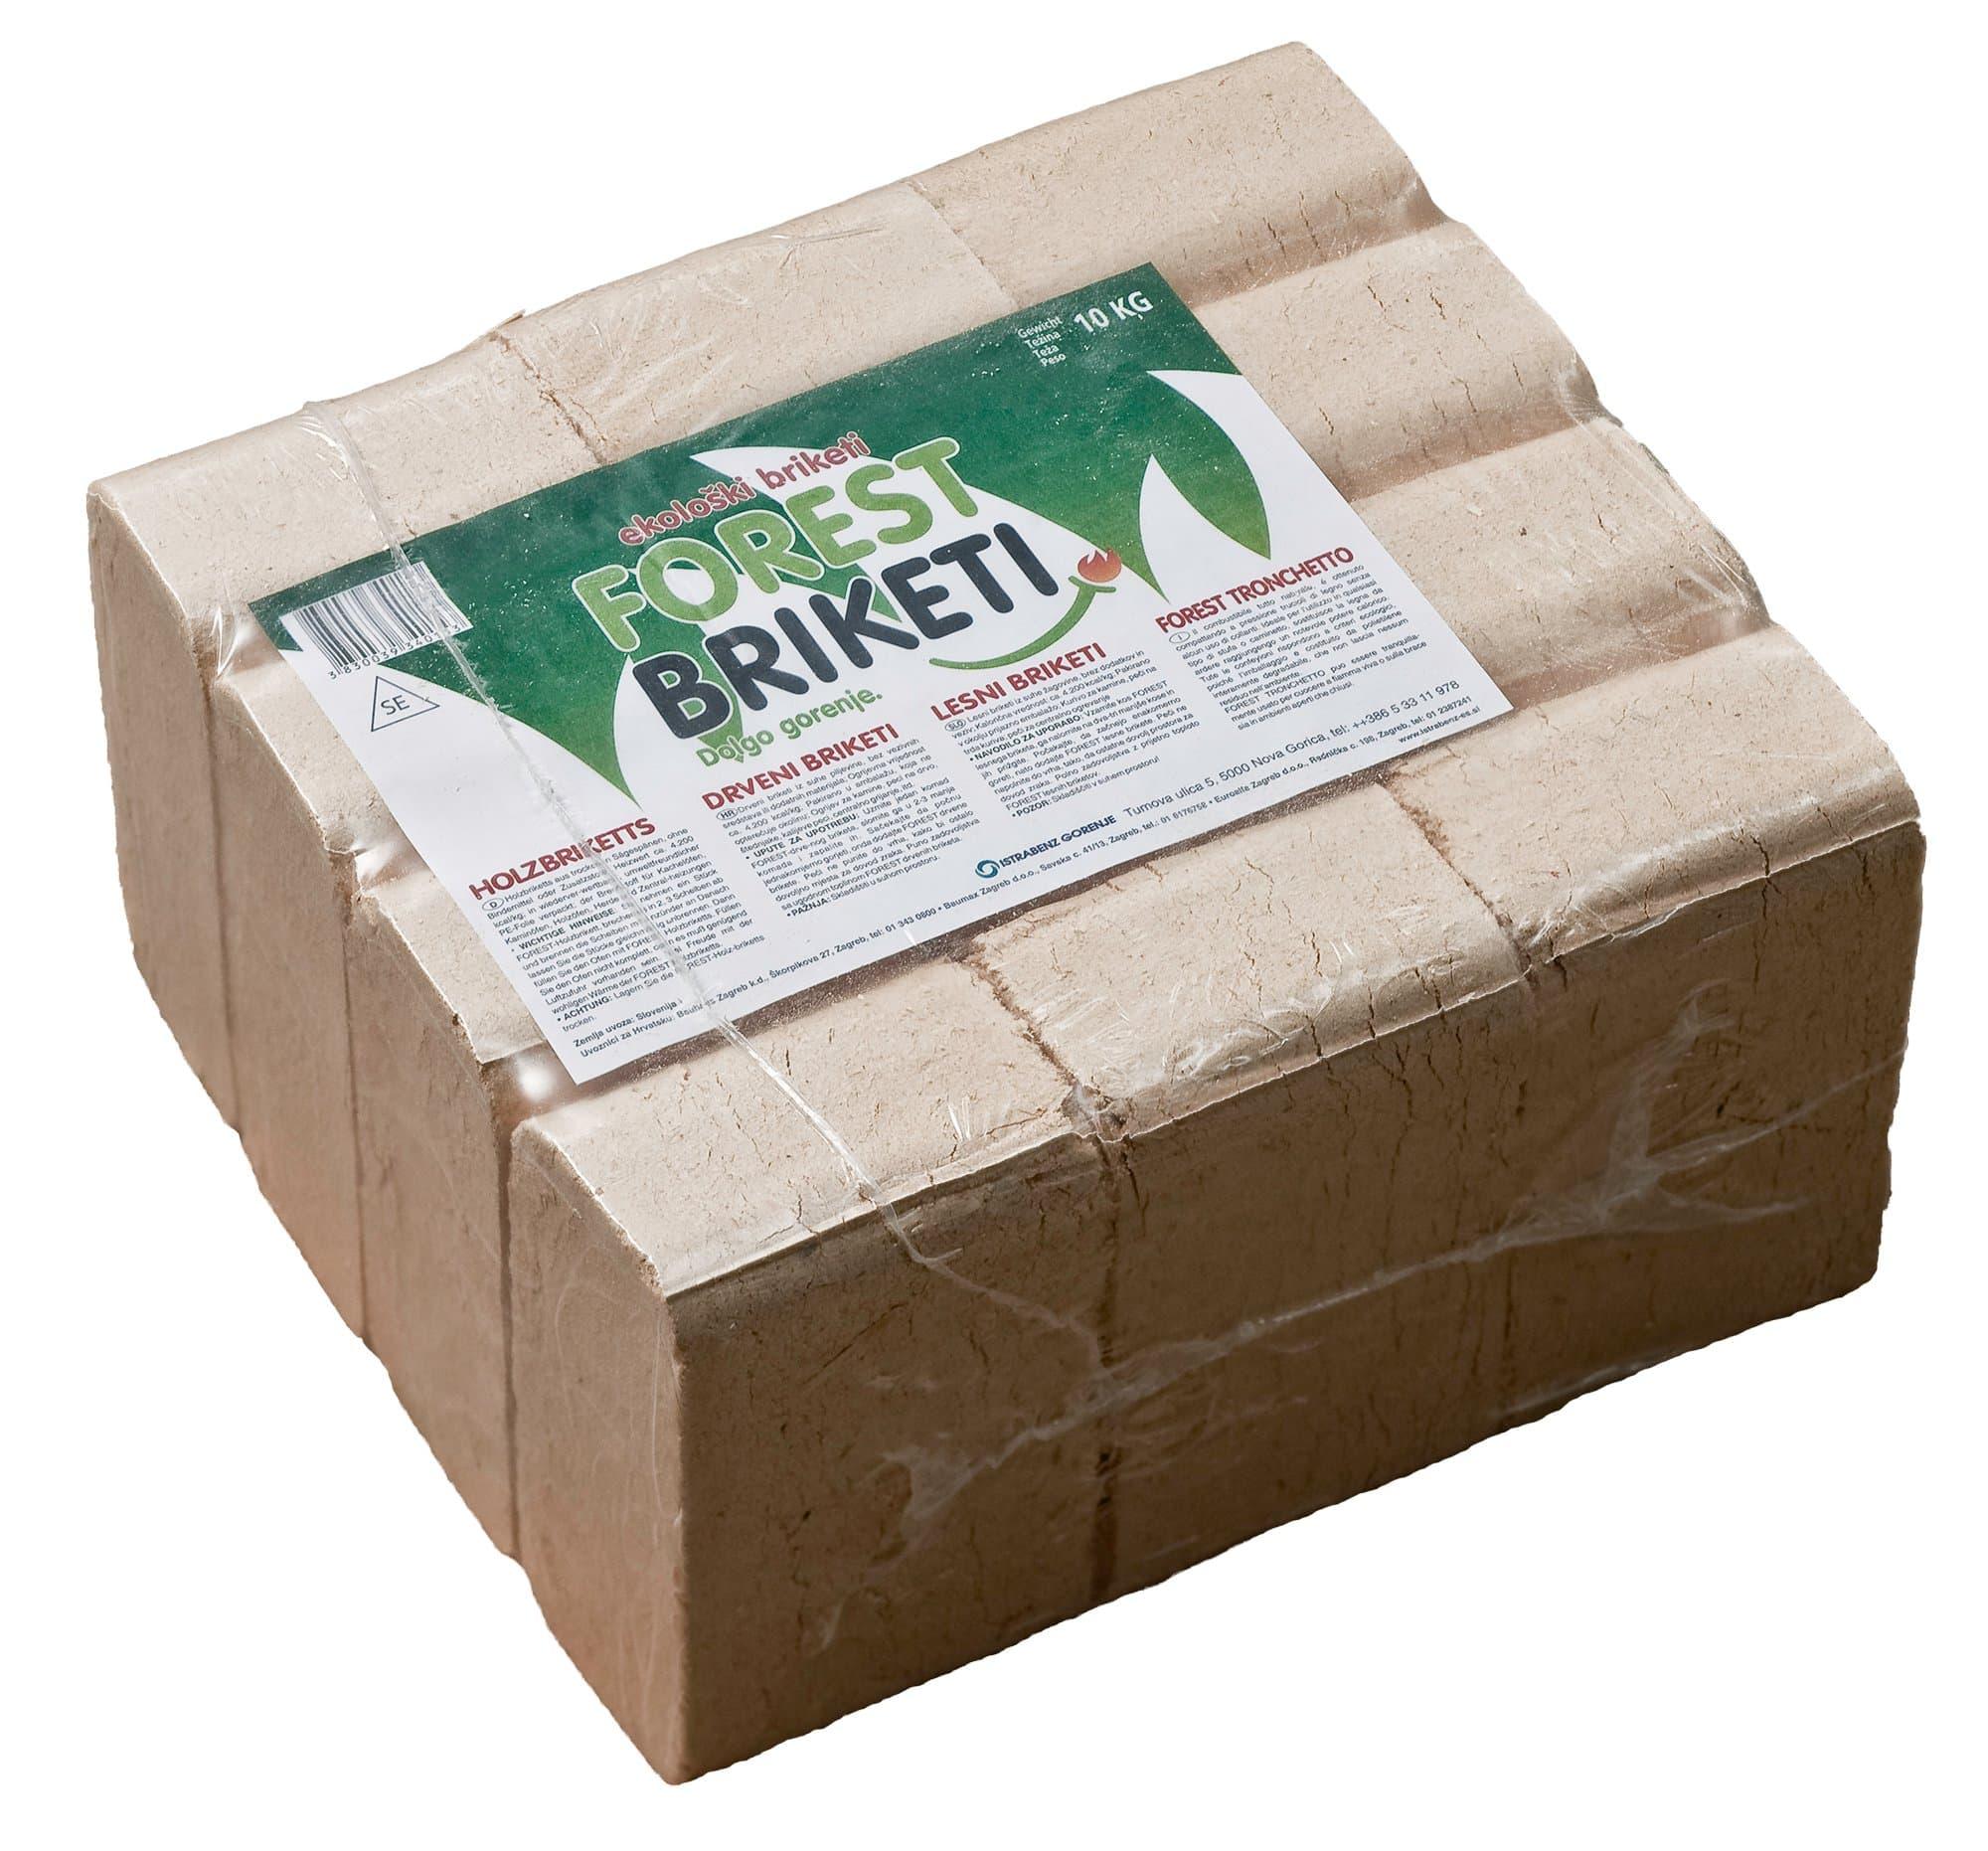 Buches de bois Forest RUF, 10 kg